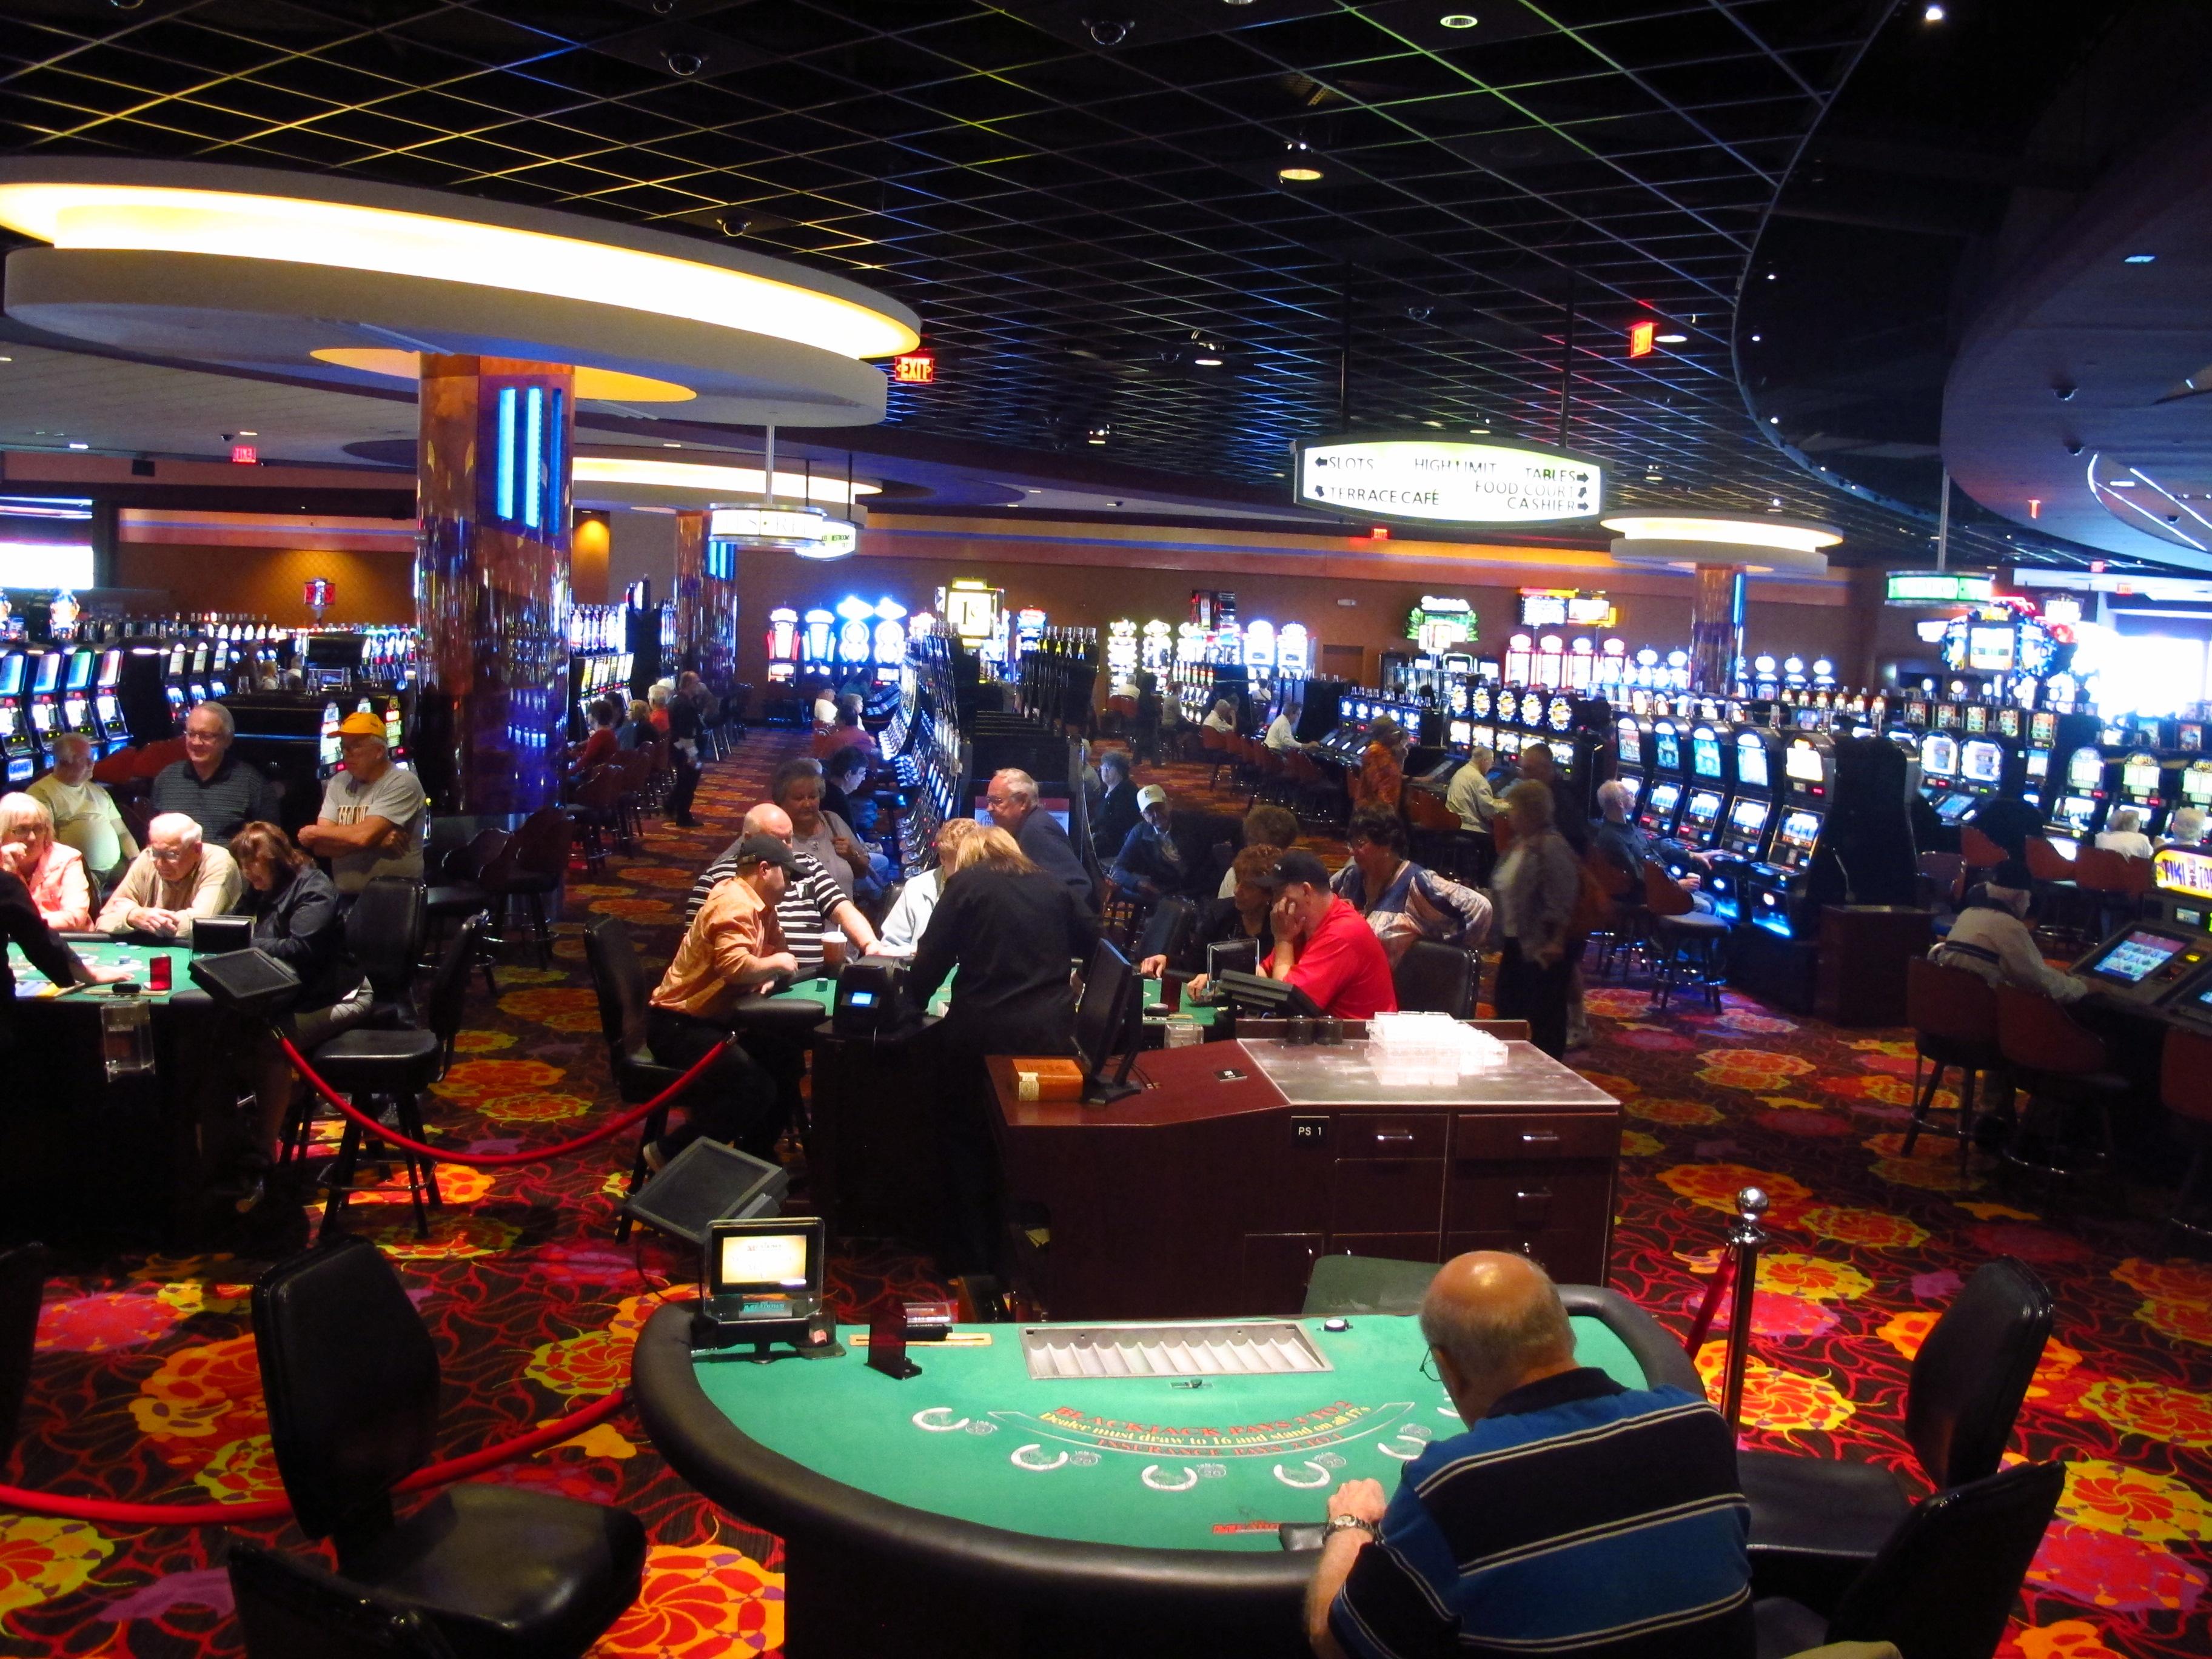 Inside casino pictures uninstall gambling blocker